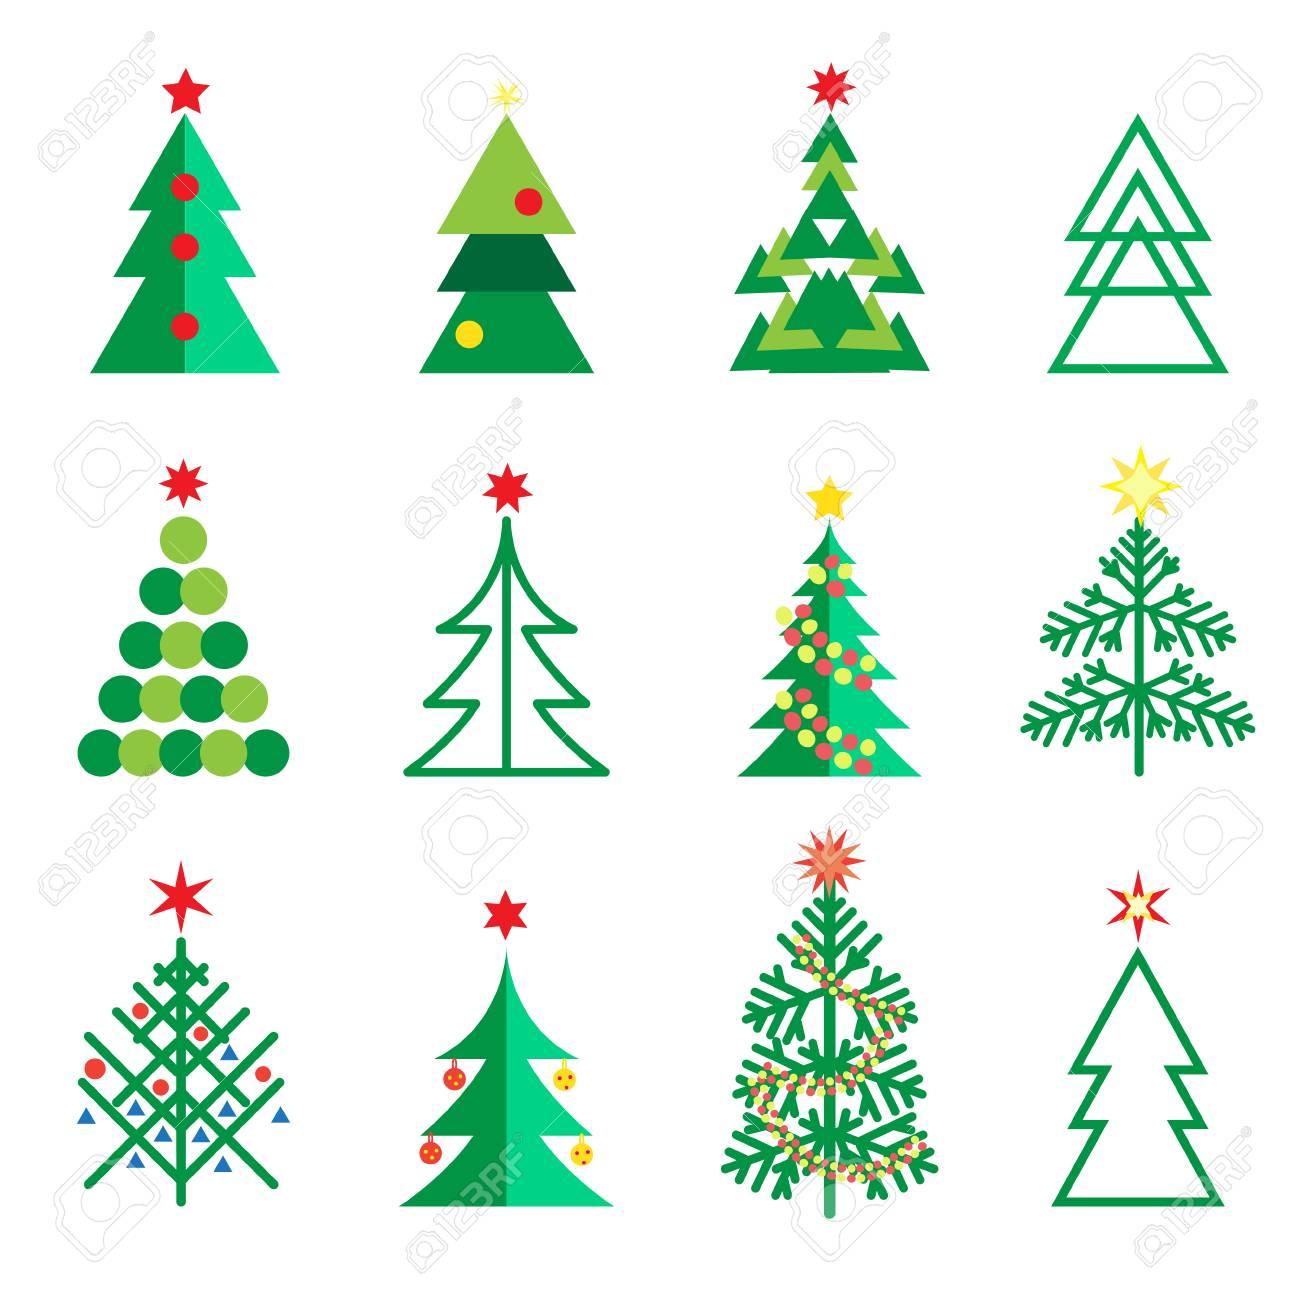 Christmas Decoration Fir Tree Symbols Abstract Geometric Design